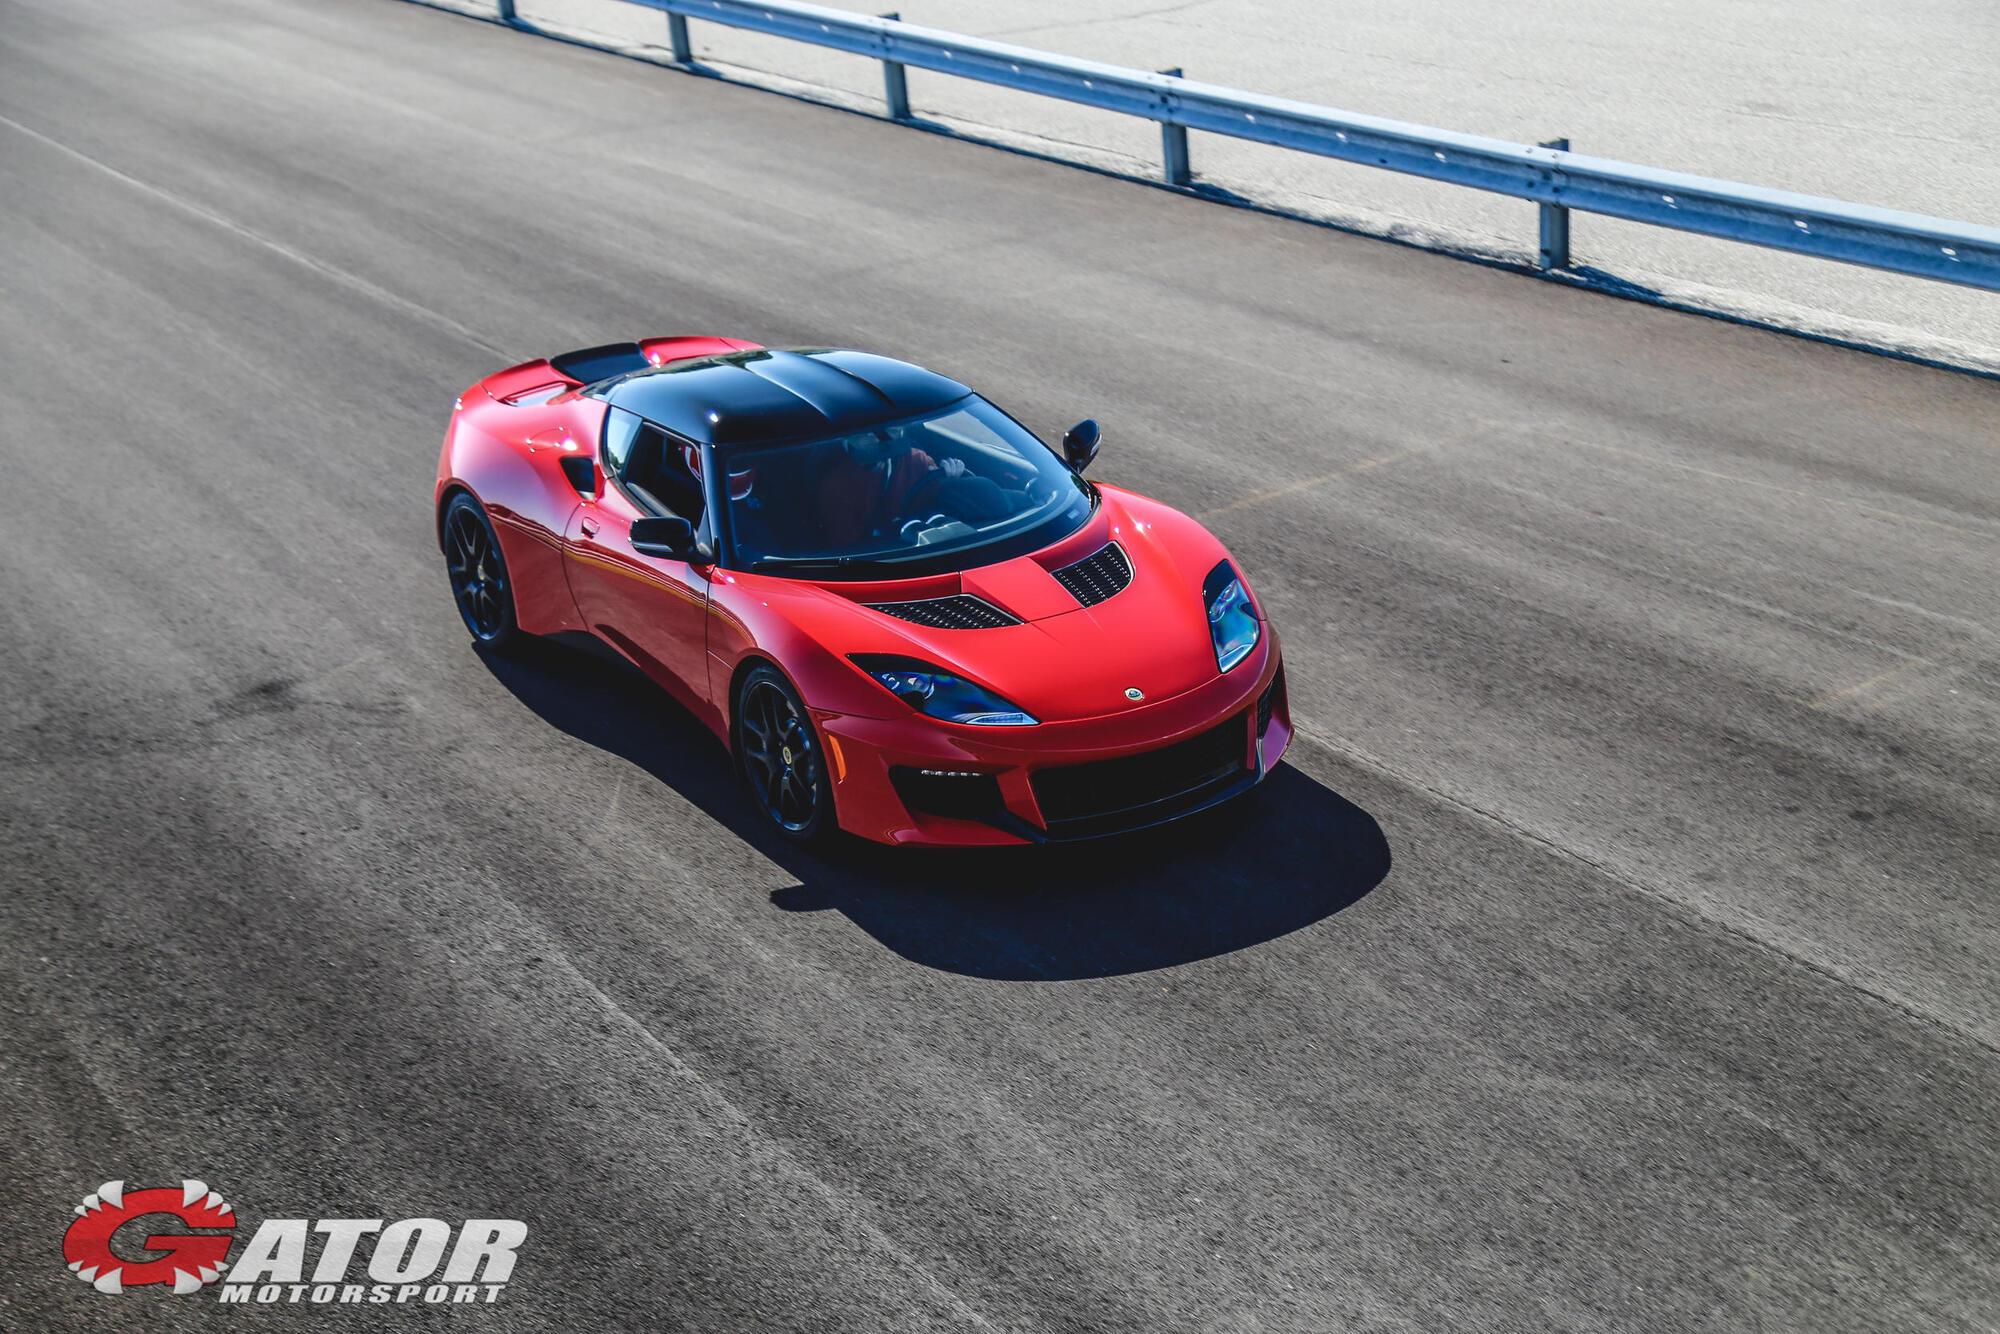 Gator Motorsport